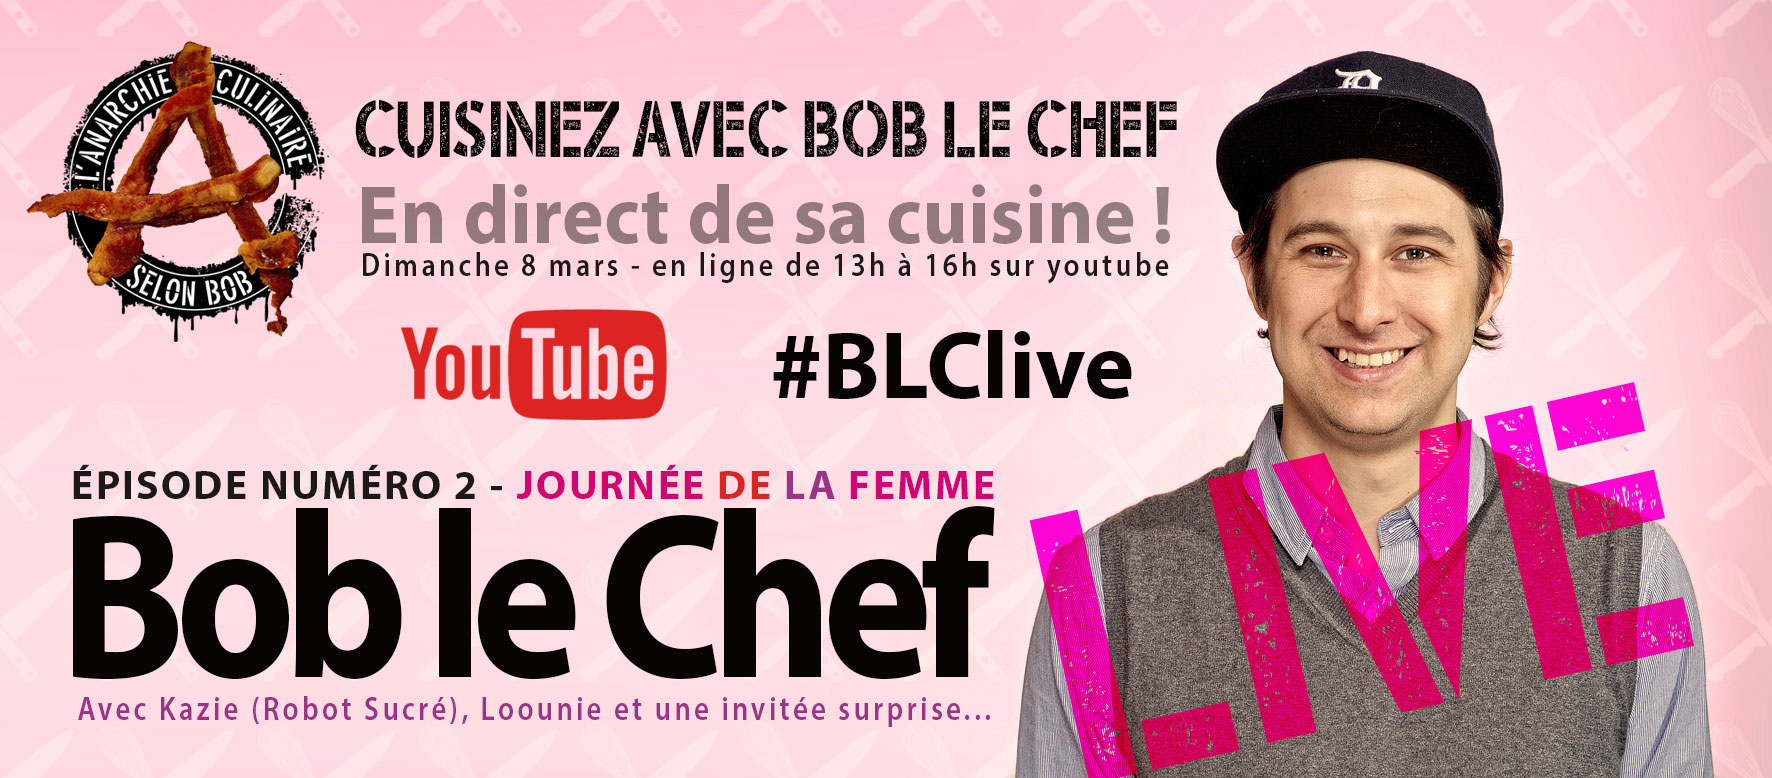 boblechef_live_flyer-2015-03-08